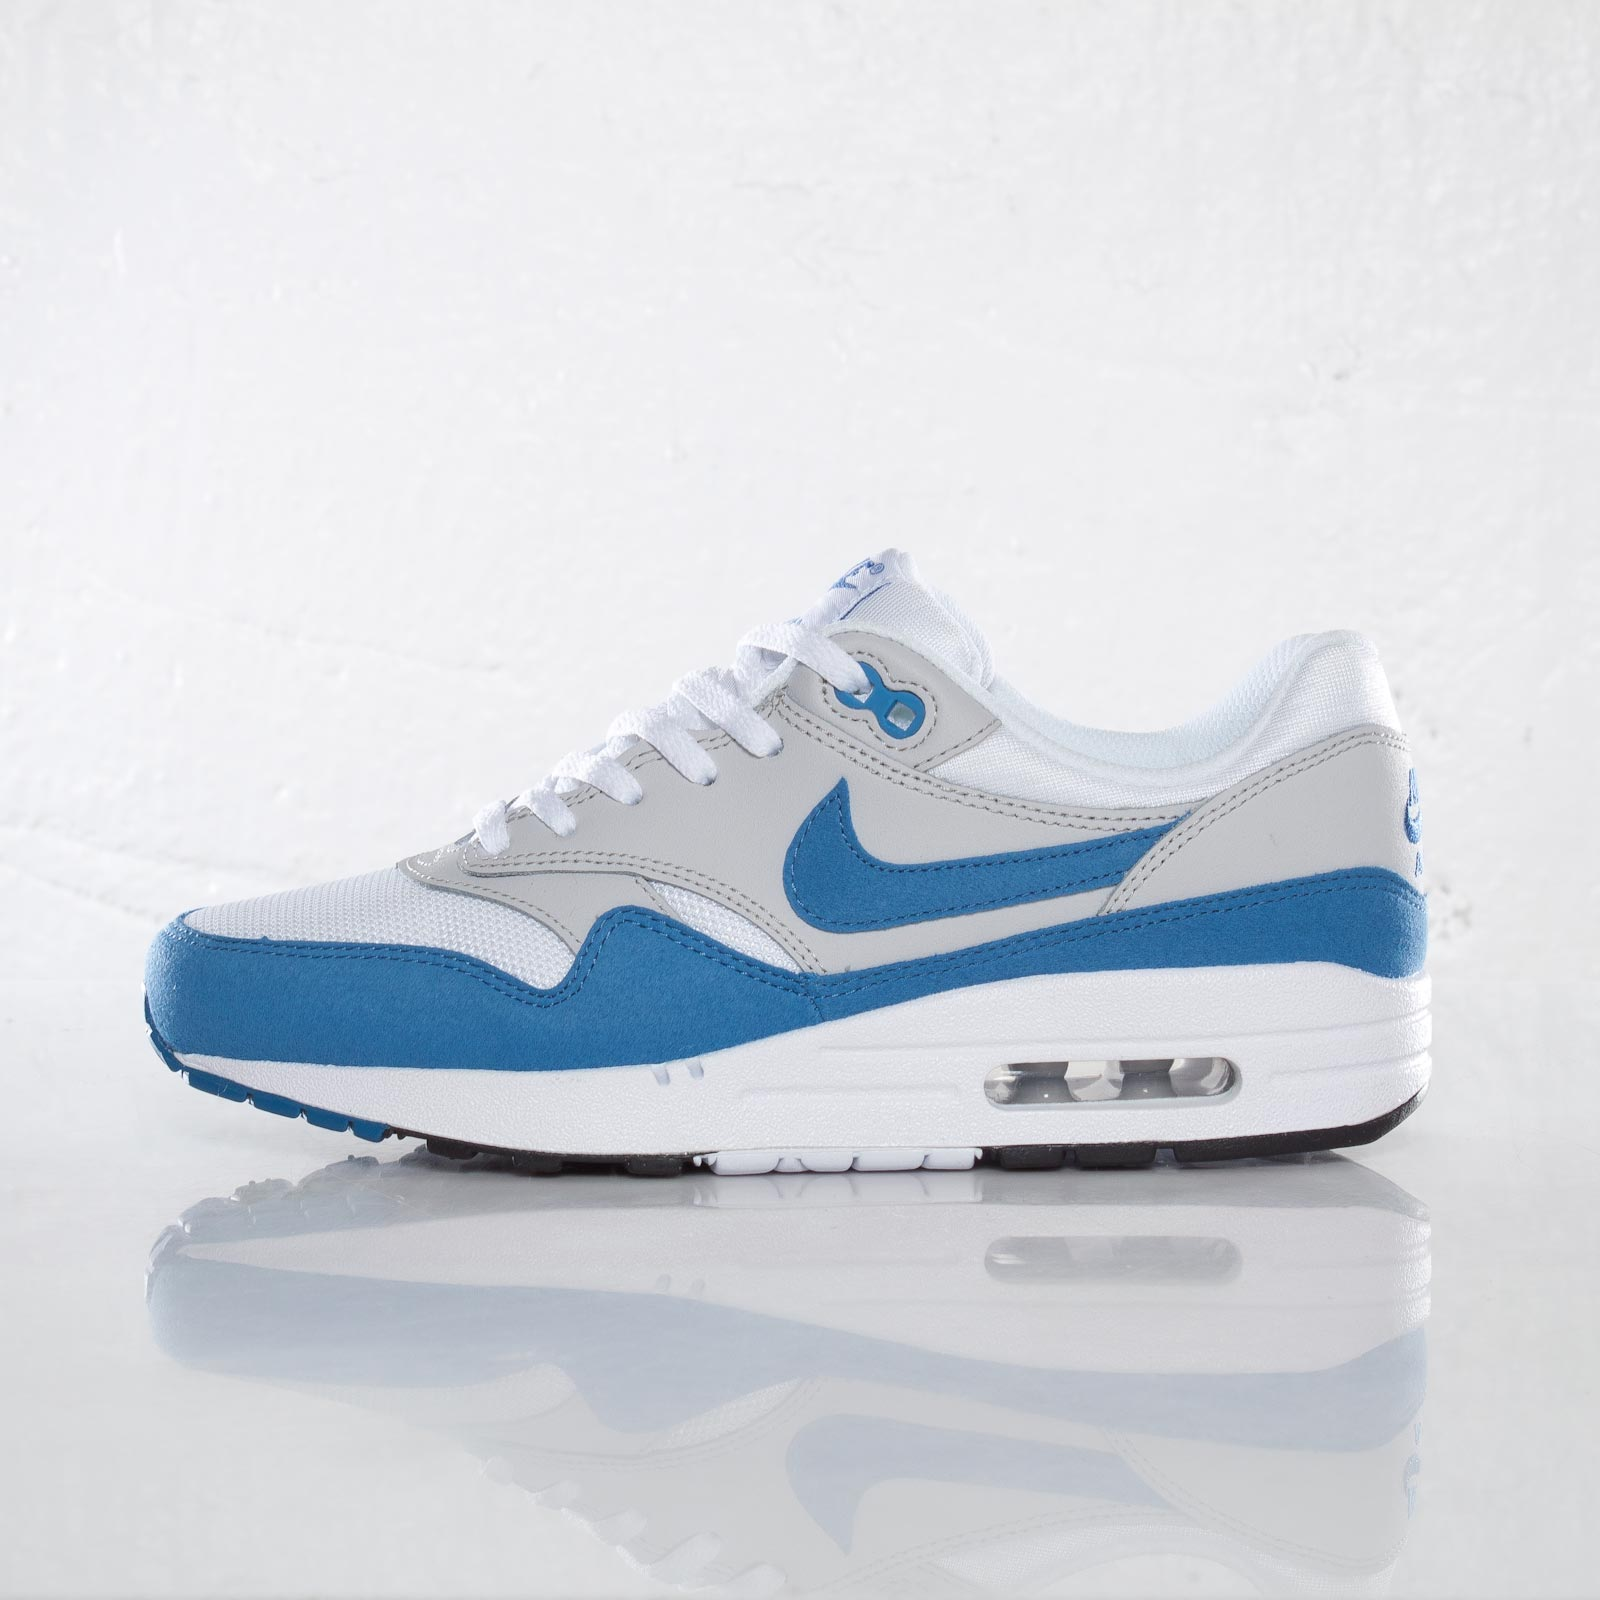 Nike Air Max 1 GS White Varsity Blue Neutral Grey Black